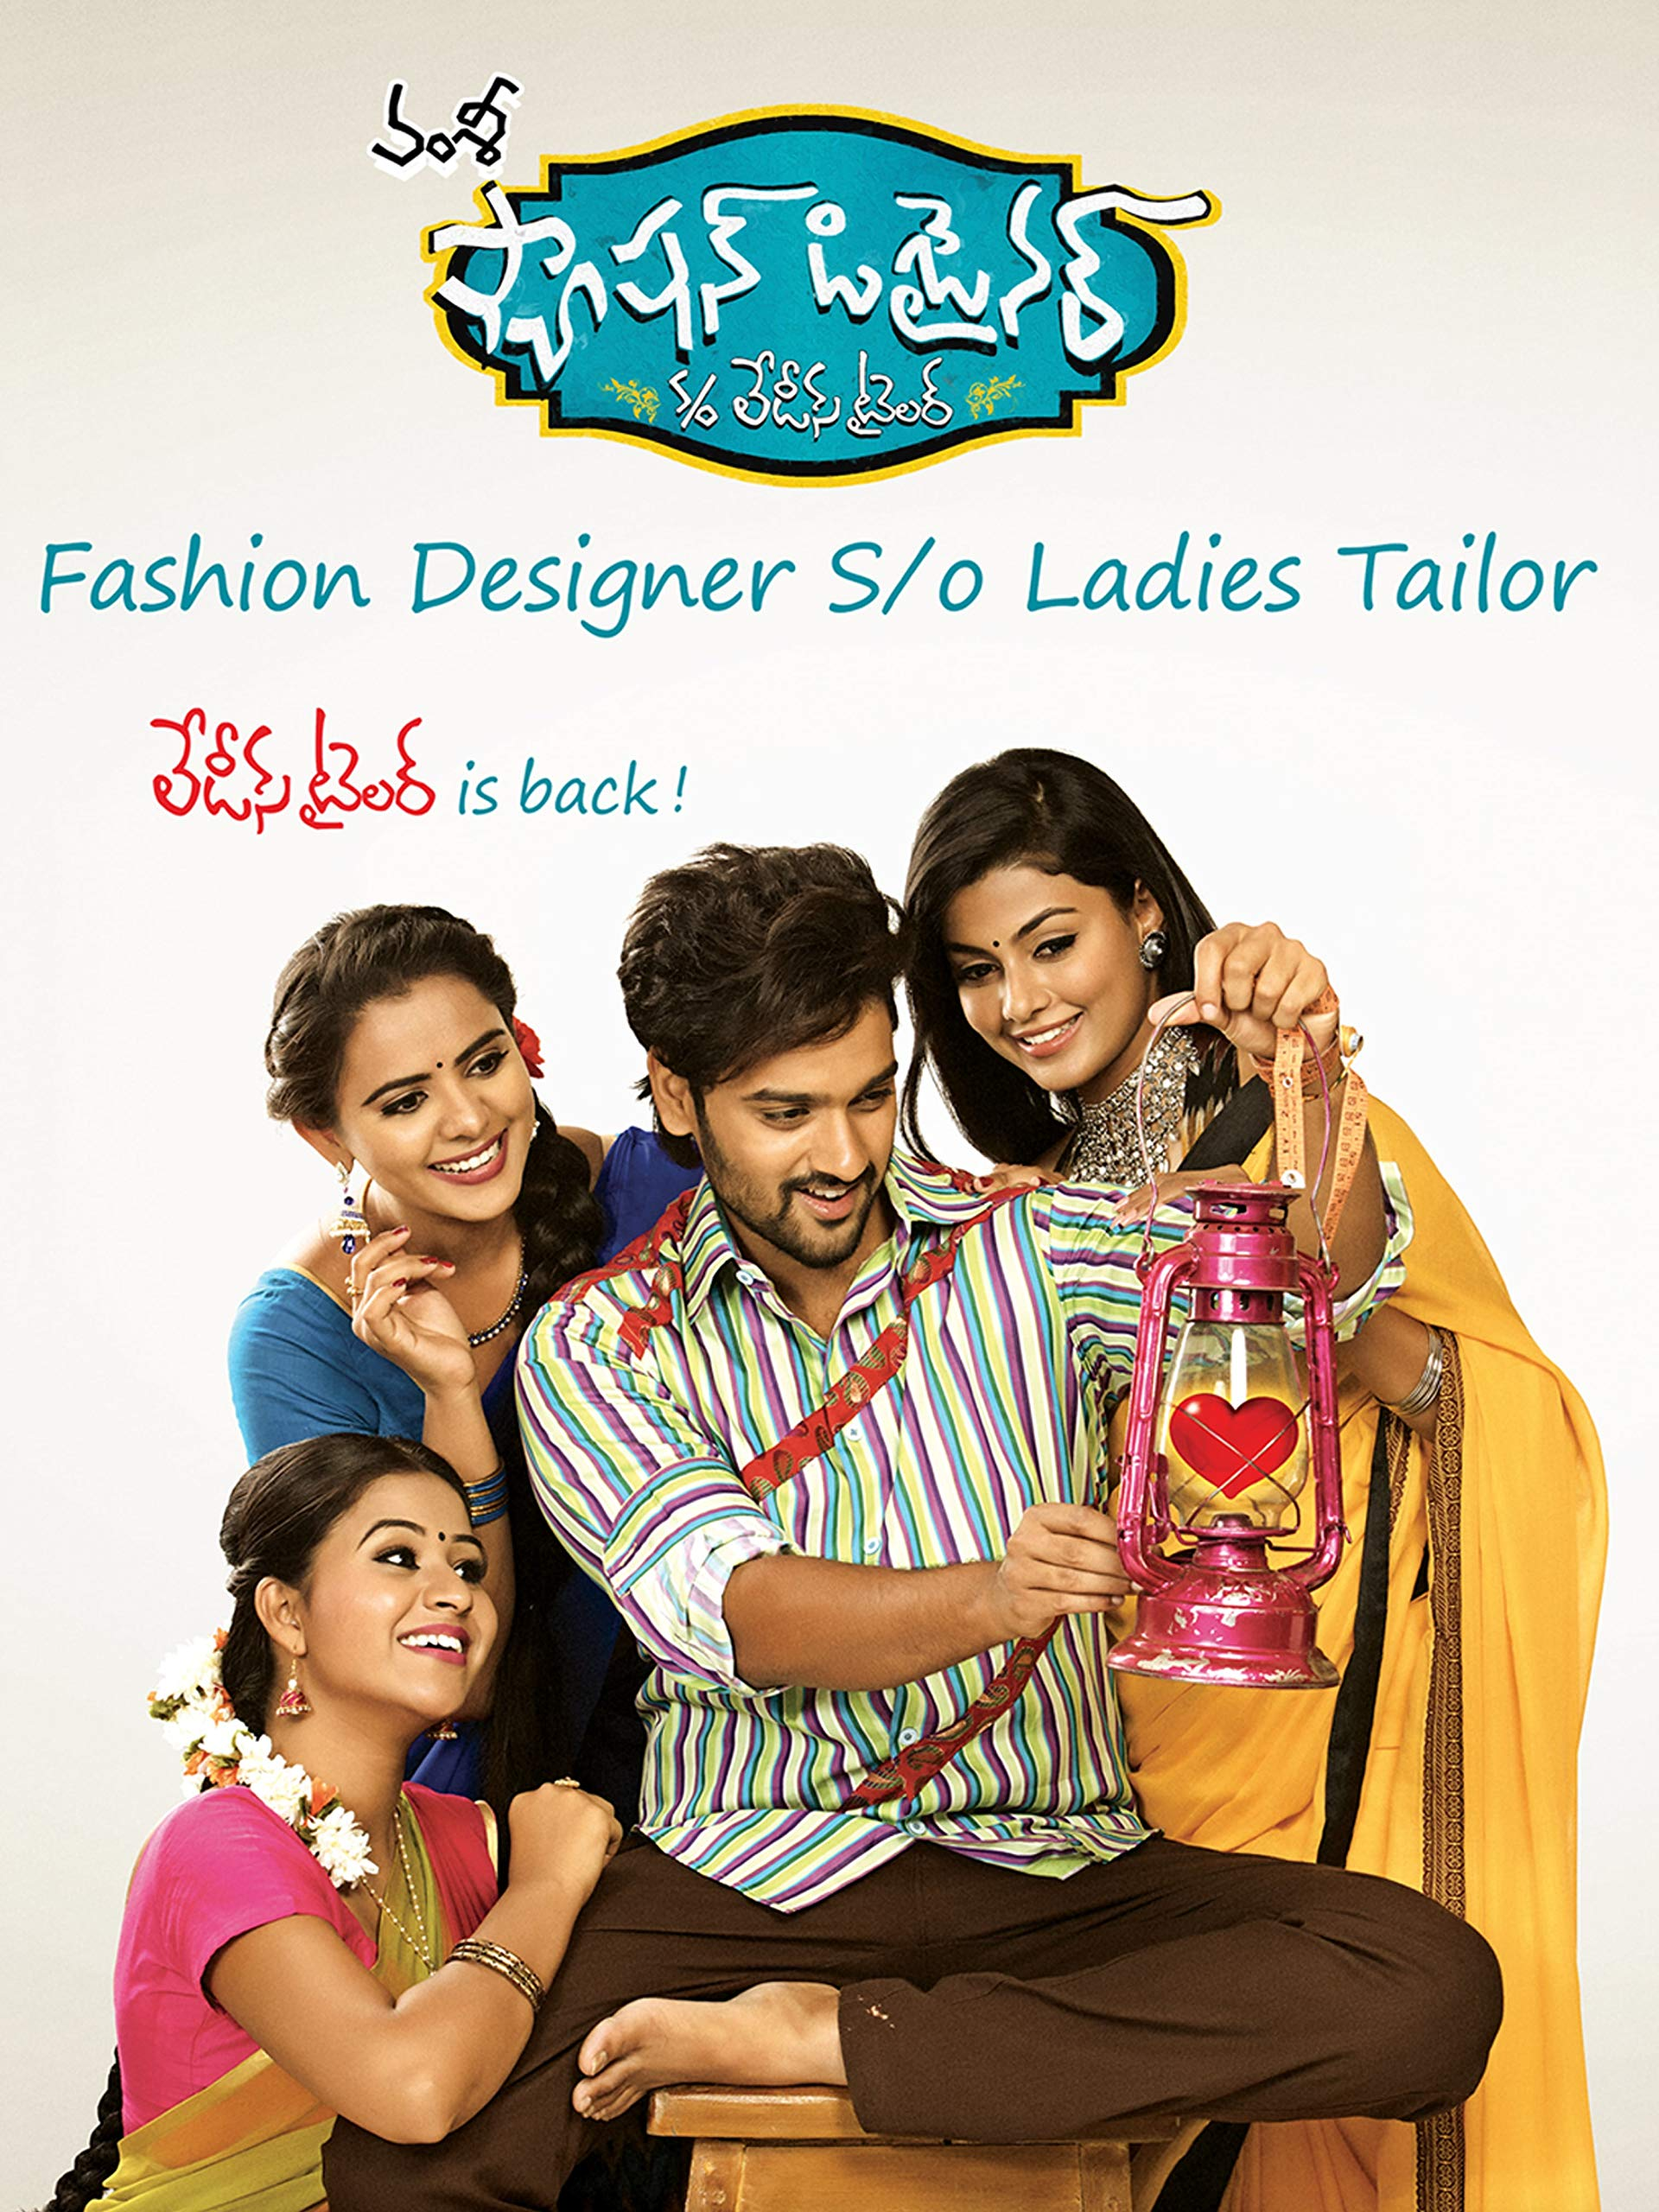 Fashion Designer S/o Ladies Tailor on Amazon Prime Video UK